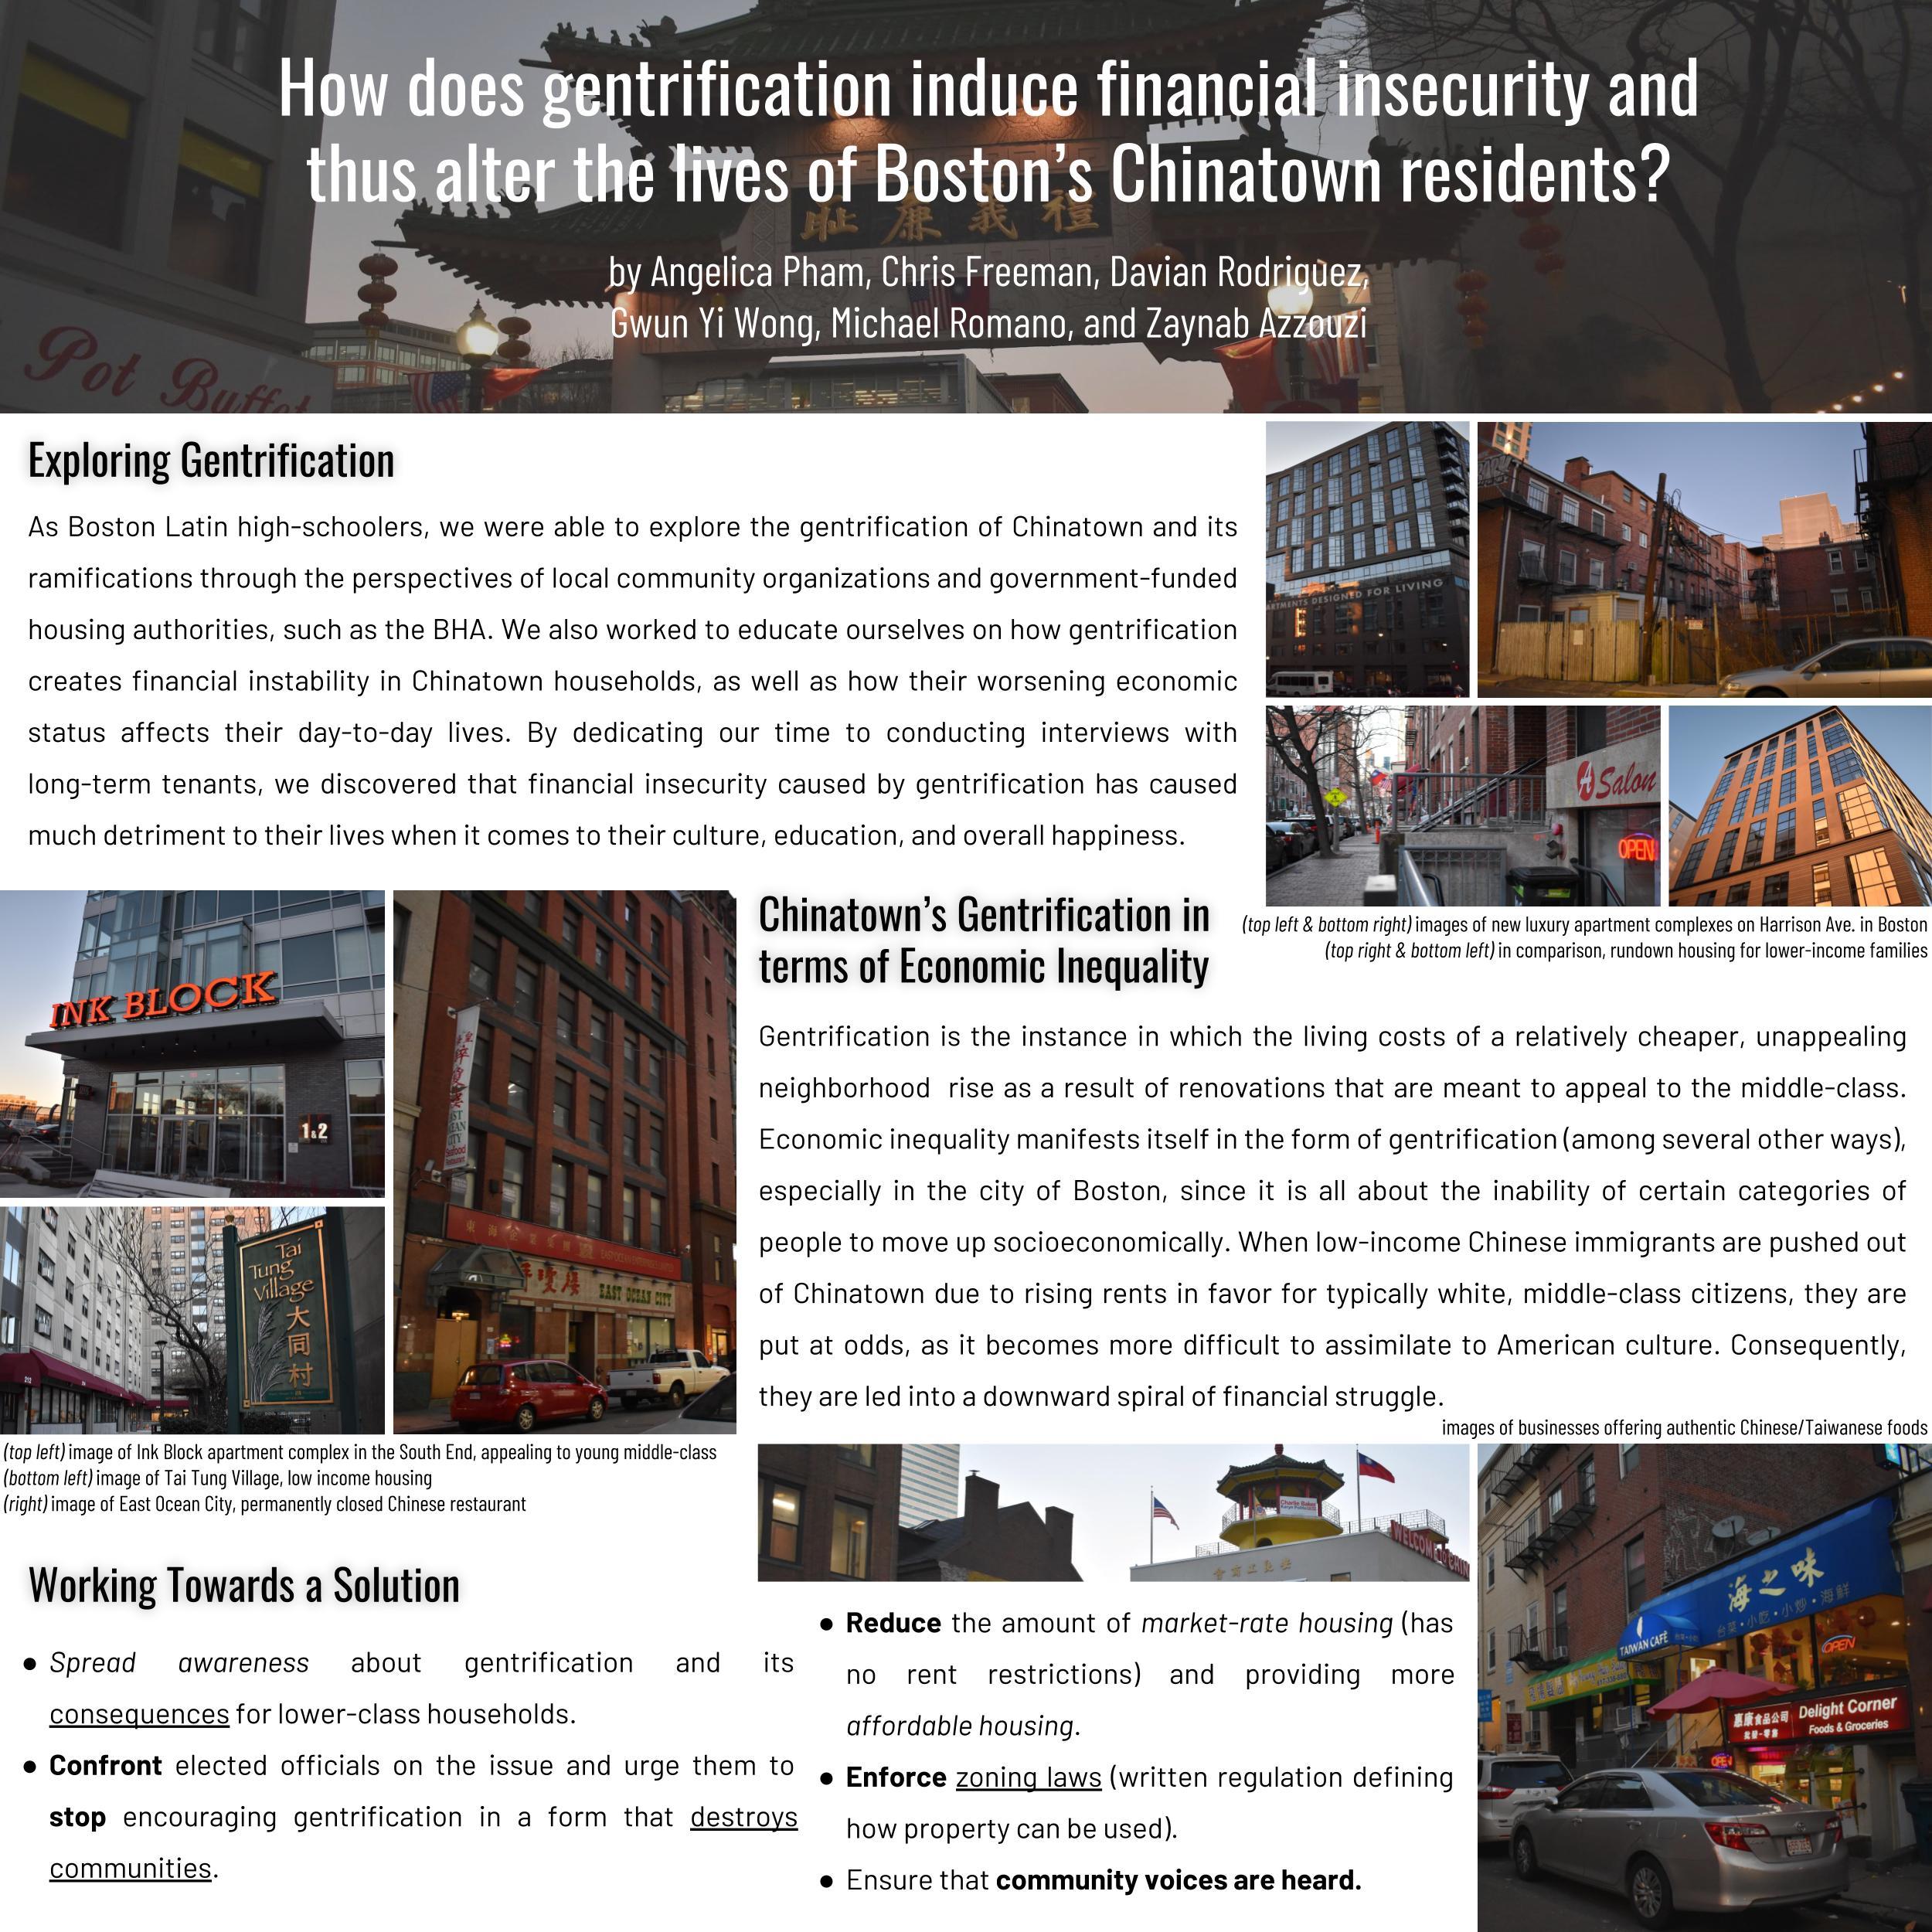 BurkeGentrificationinChinatownPham.jpg